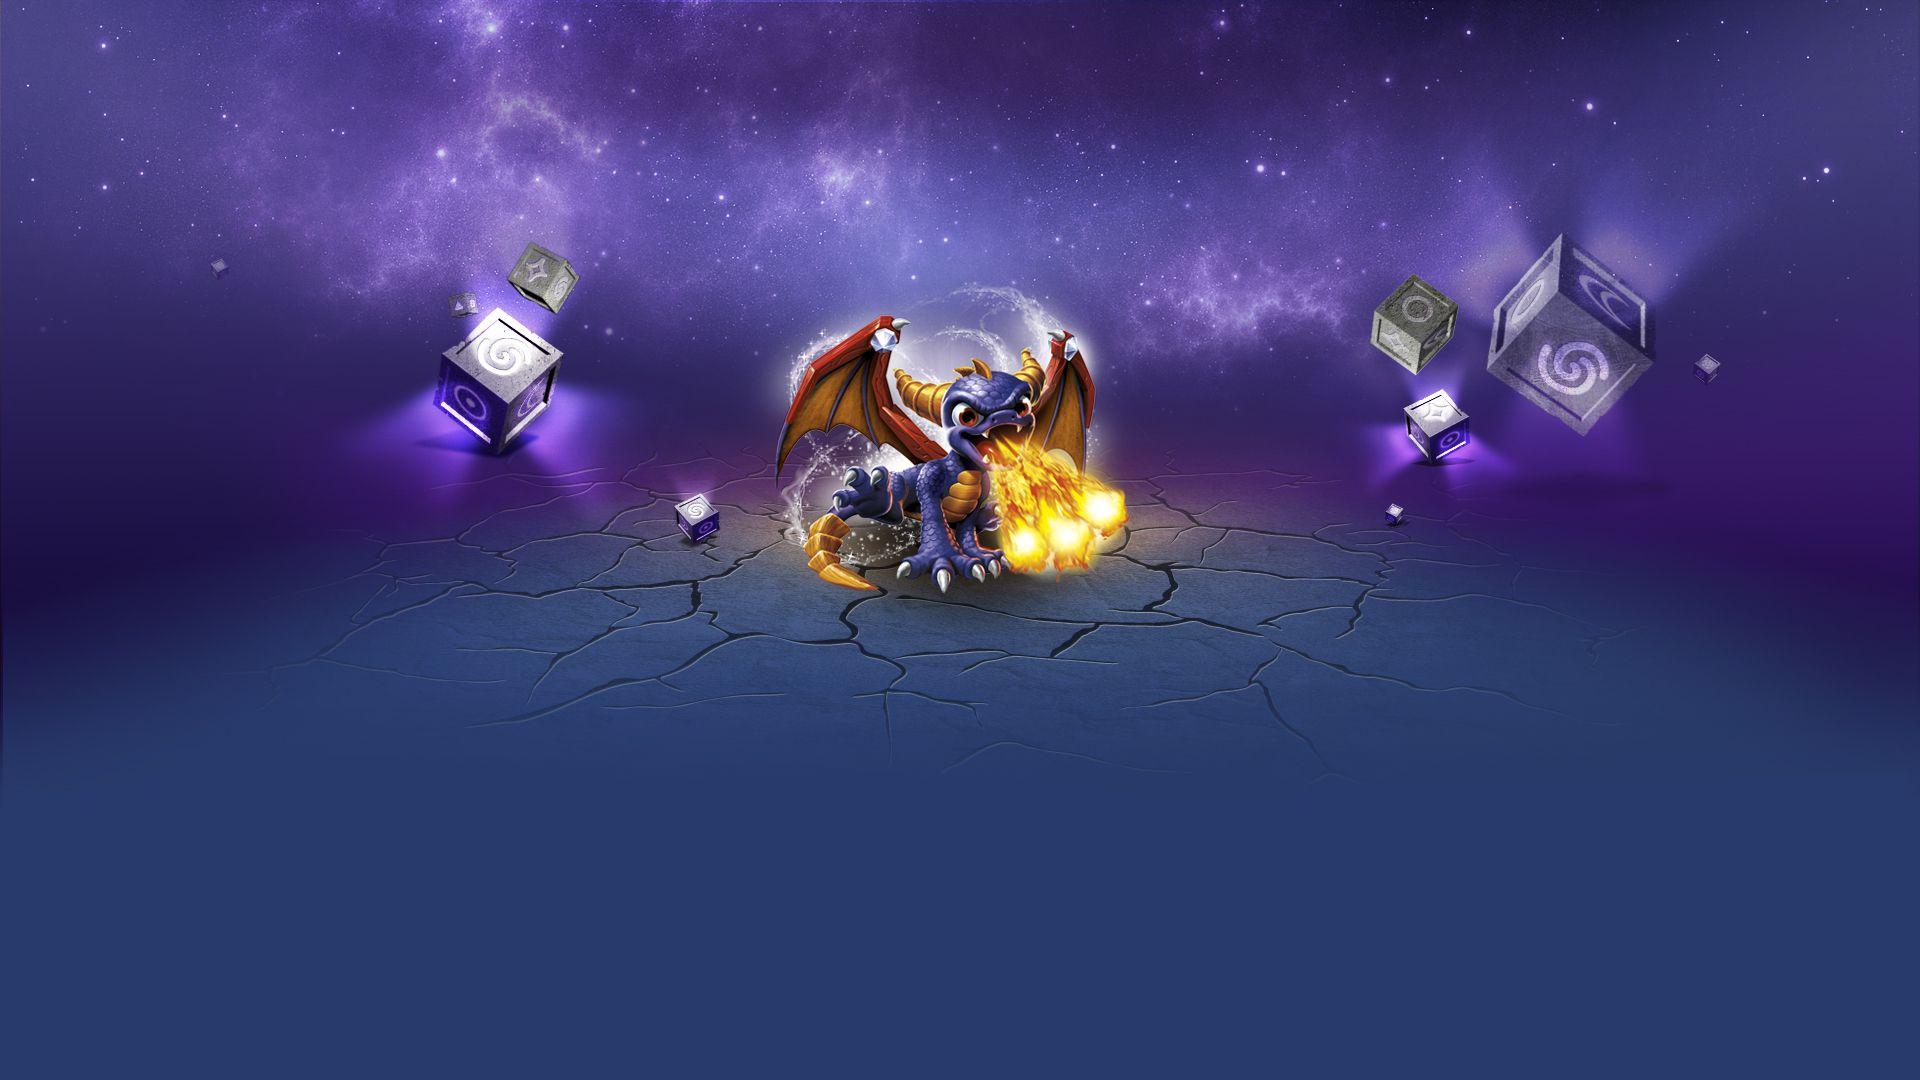 Spyro - The Amazing World of Gumball FanFic Wiki